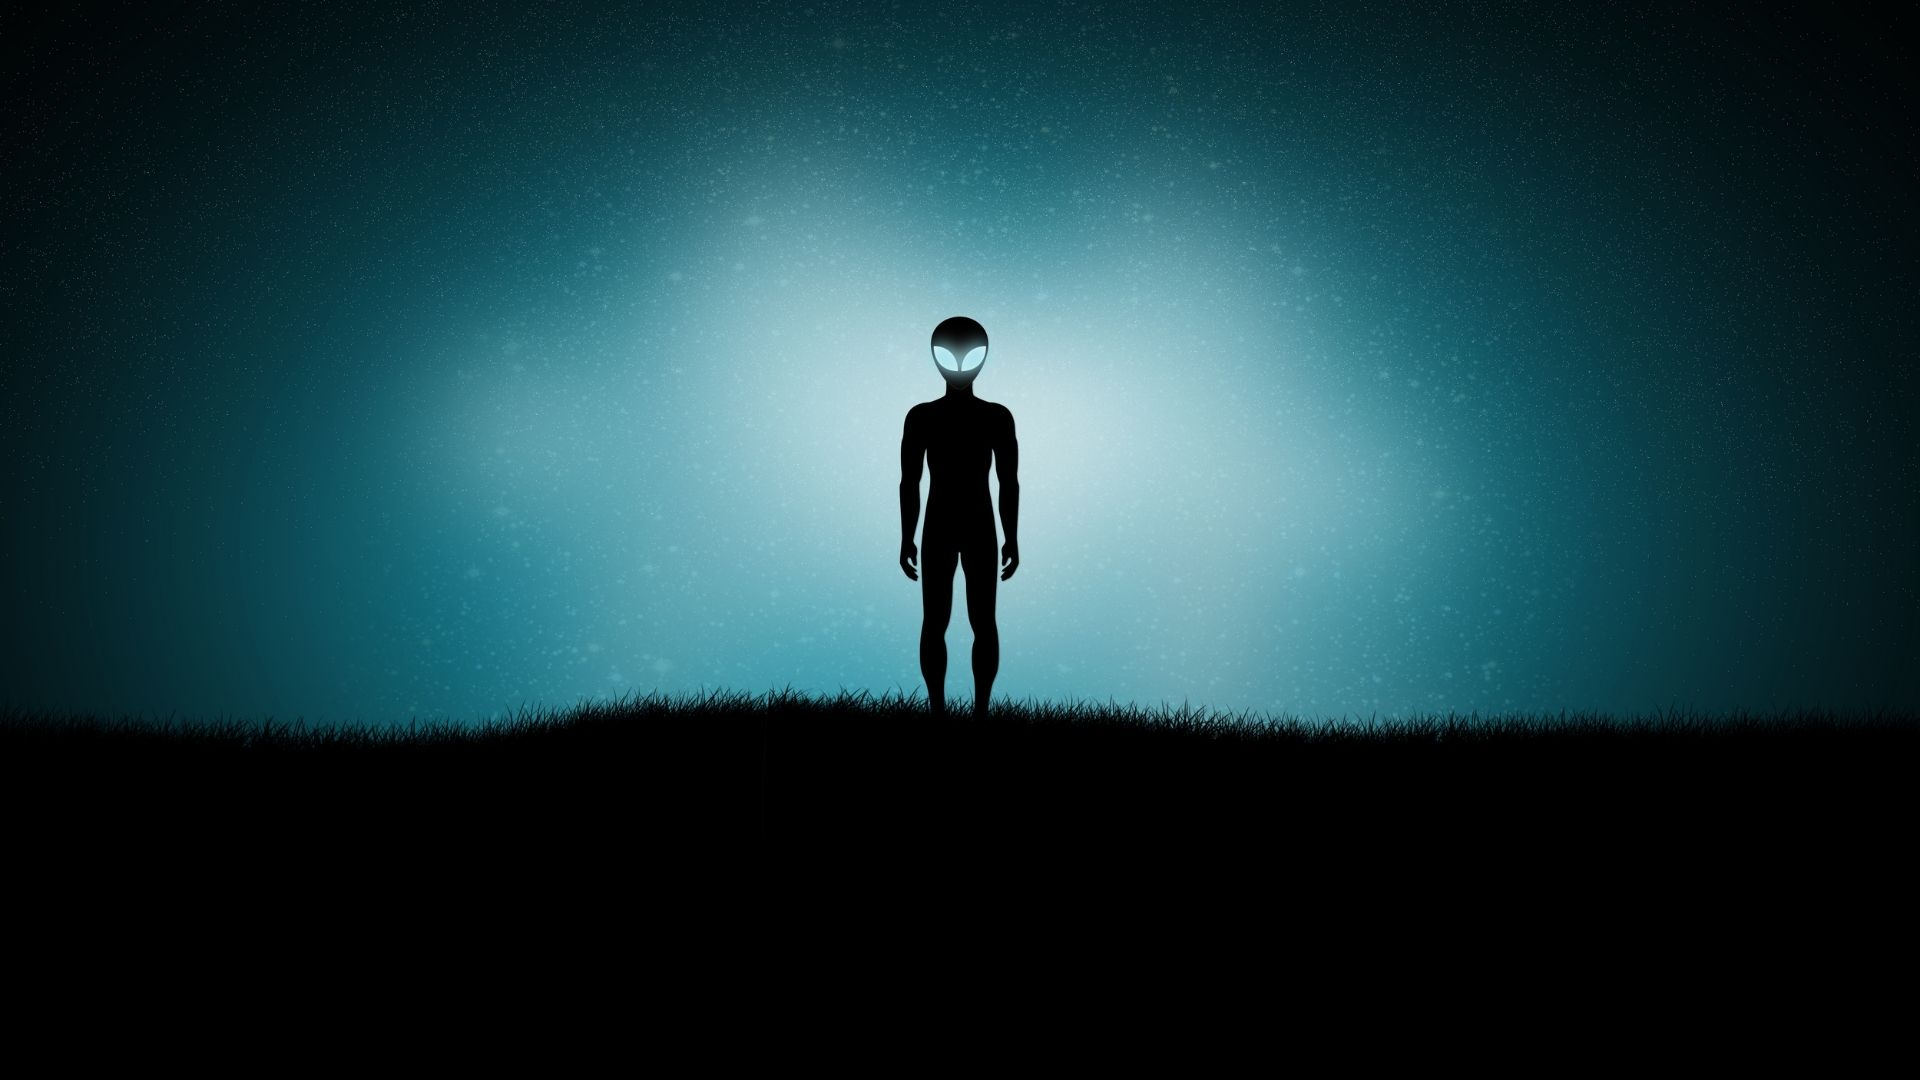 Episode 480 Poetry - An Alien from Mars